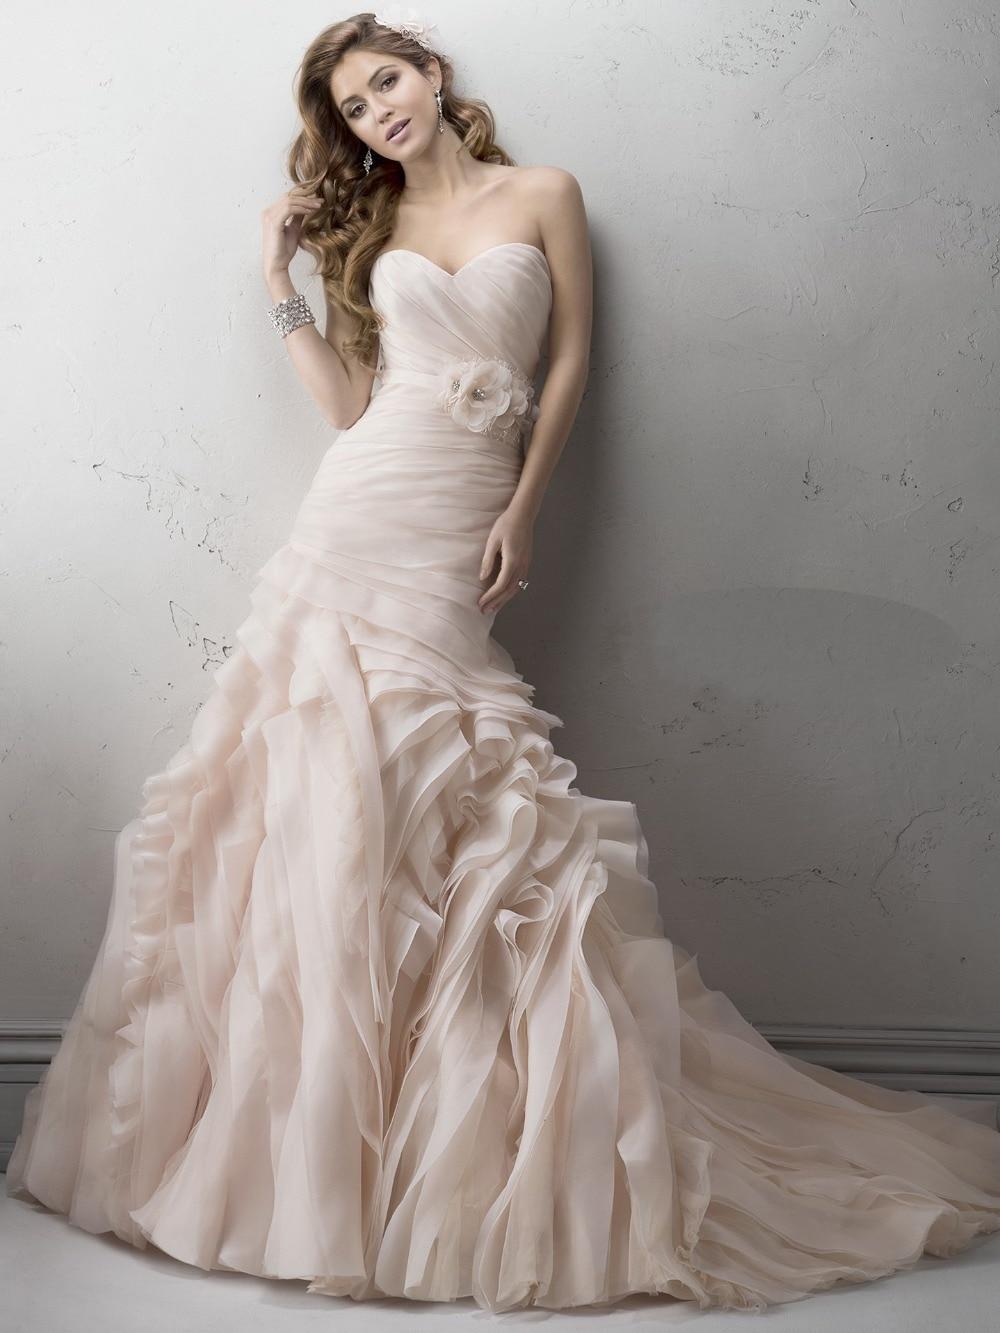 Pink and Blush Wedding Dresses